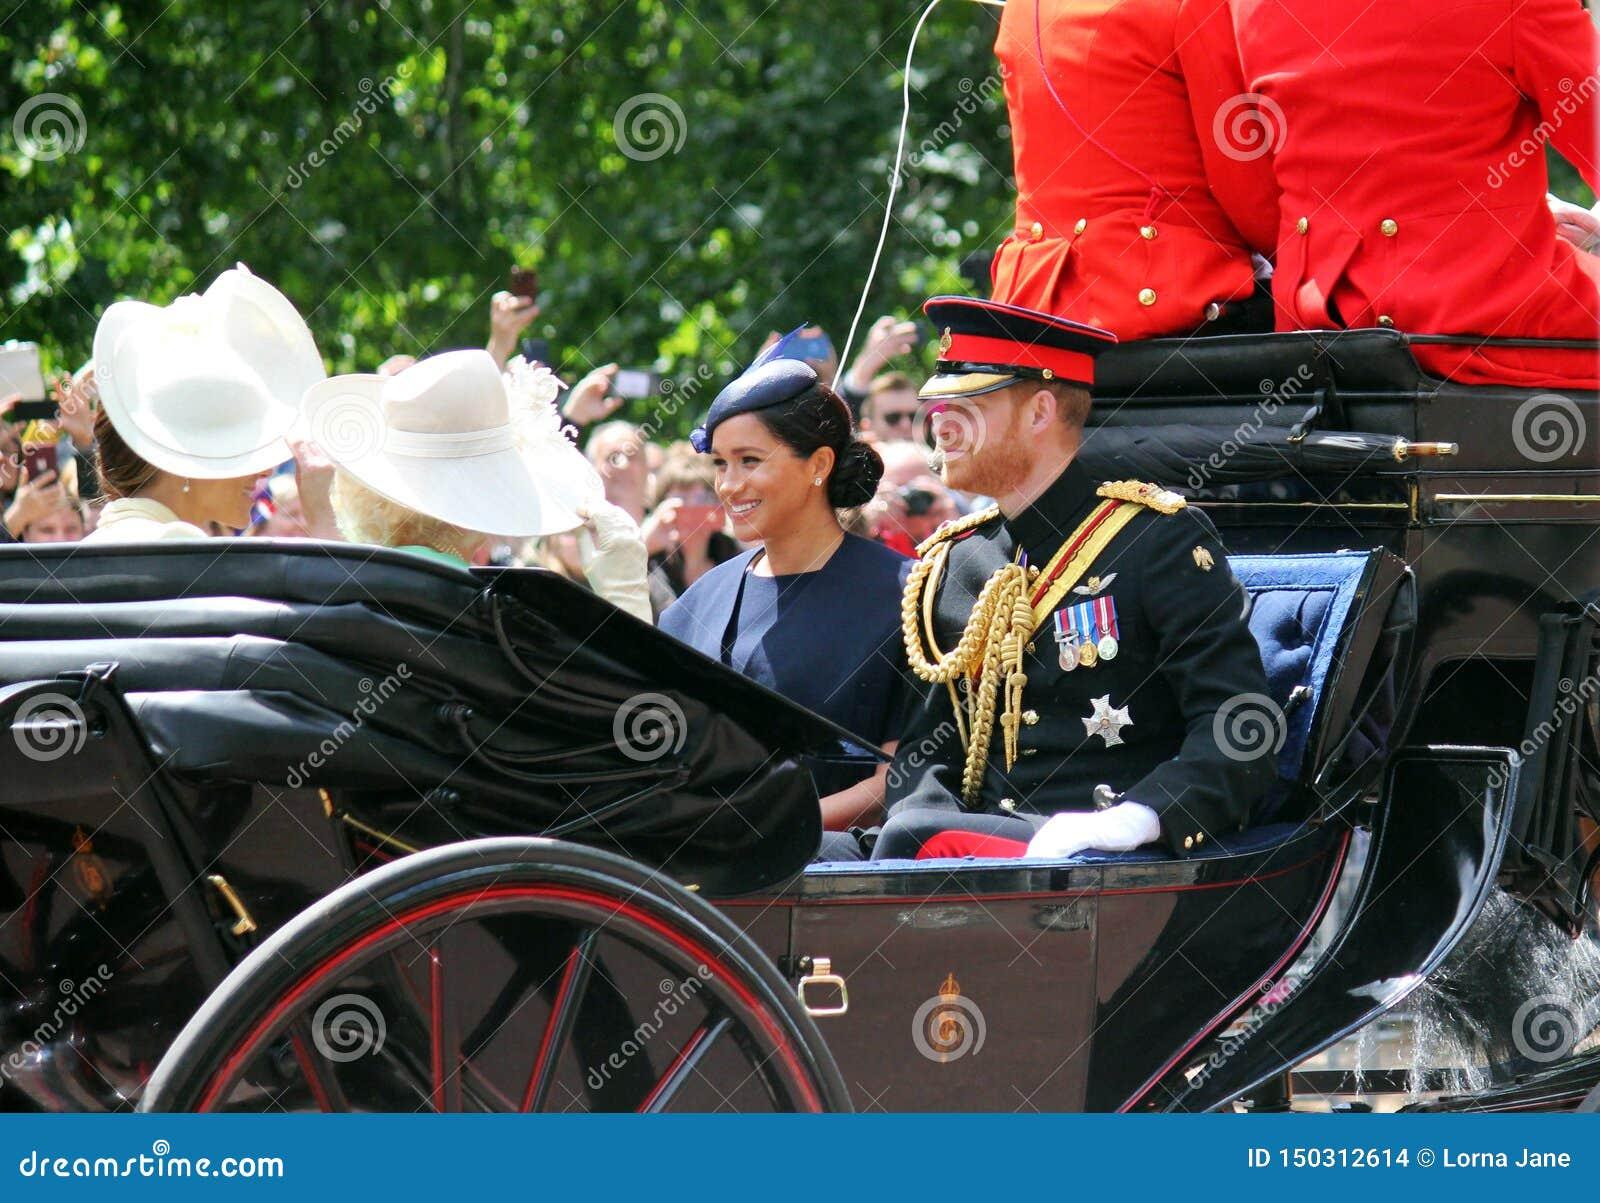 Meghan Markle, Londres R-U le 8 juin 2019 - Meghan Markle Prince Harry Kate Middleton